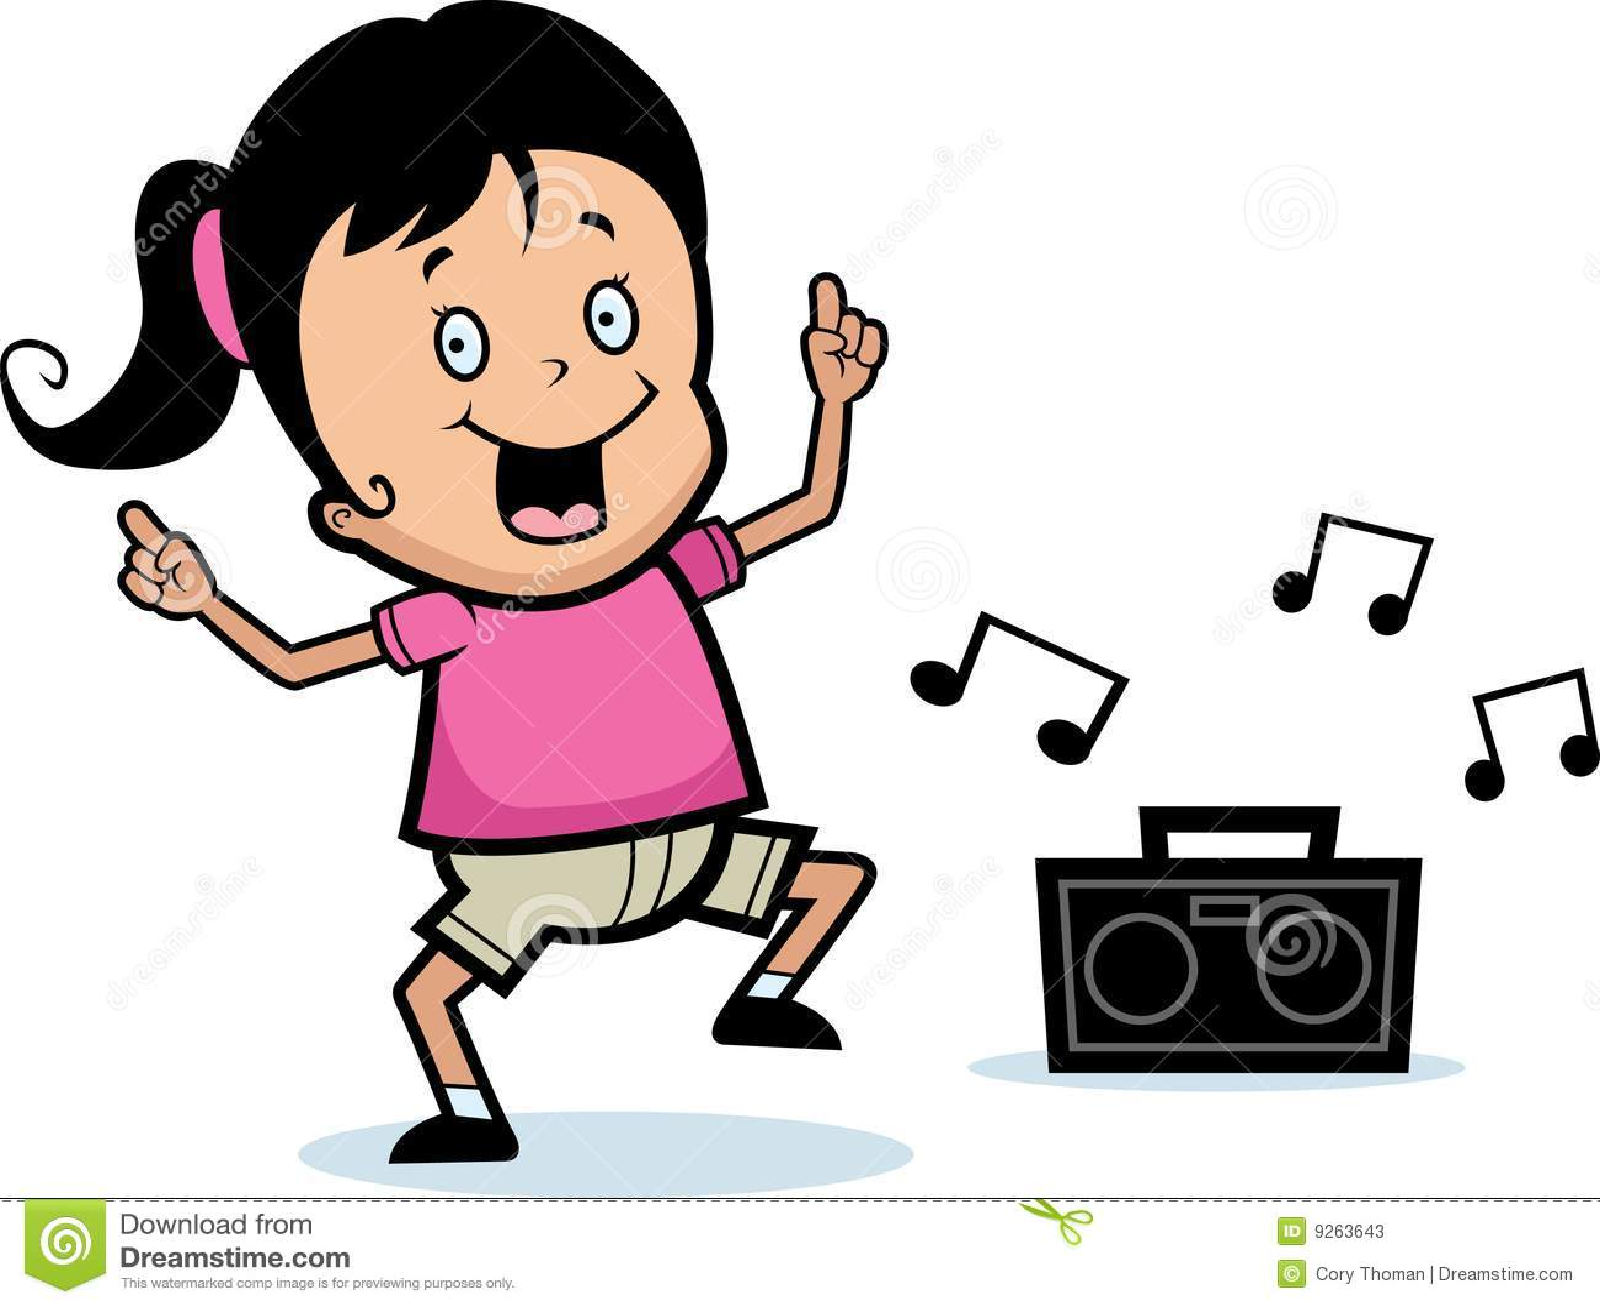 Girl Dancing Stock Vector. Illustration Of Radio, Vector